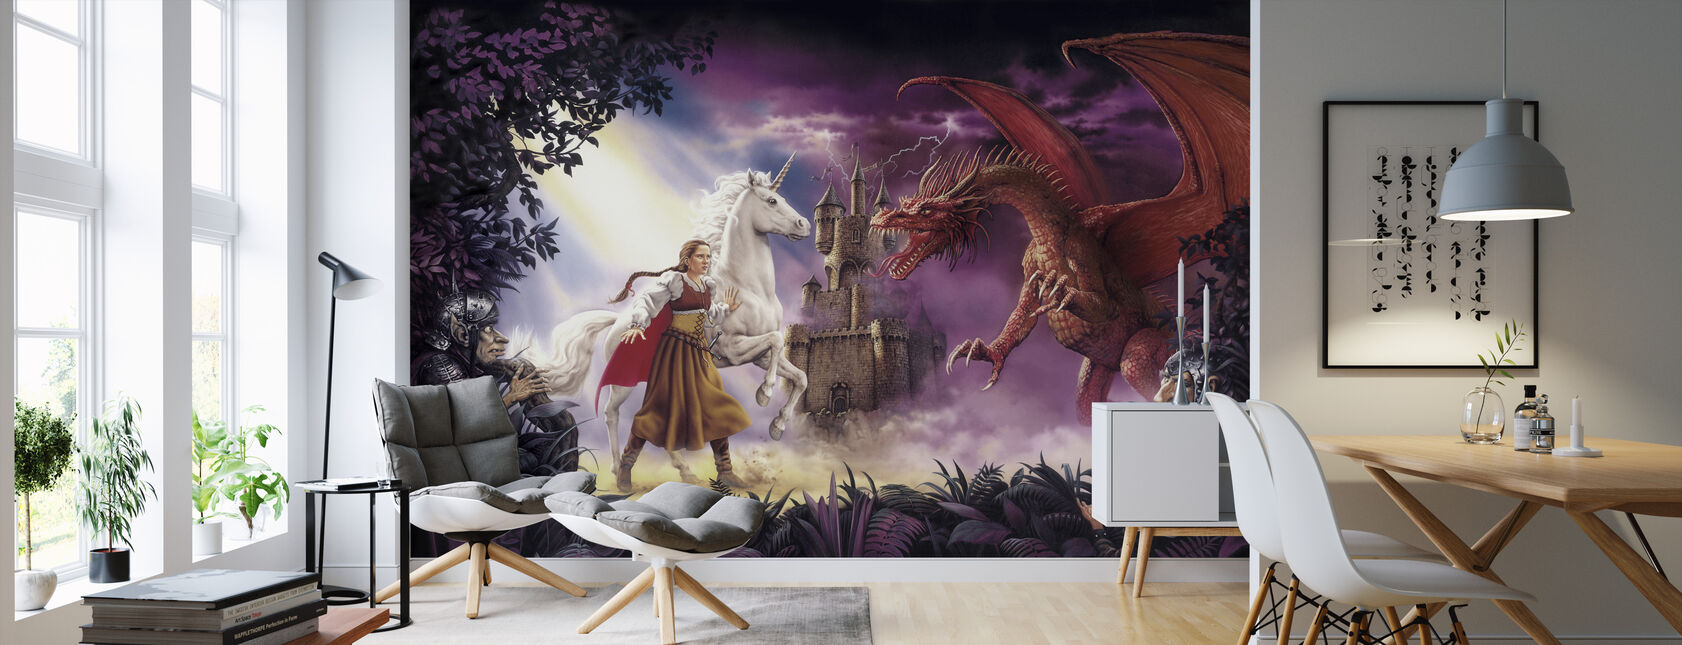 Enchanted - Wallpaper - Living Room